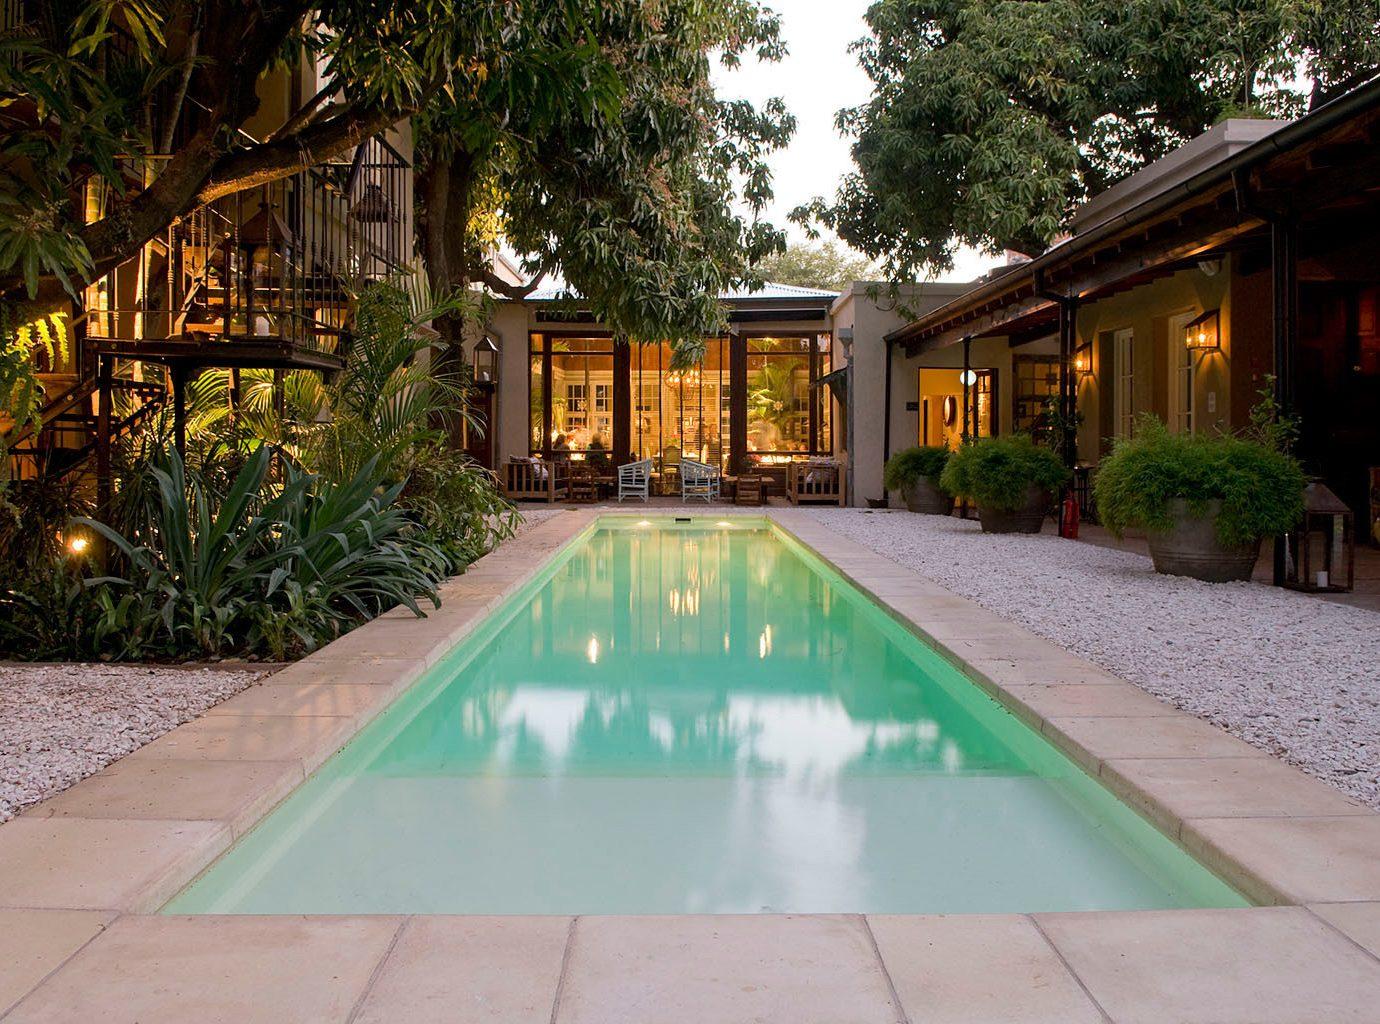 Hotels outdoor ground tree sidewalk swimming pool property estate green Resort Courtyard backyard home Villa real estate mansion hacienda yard way walkway curb